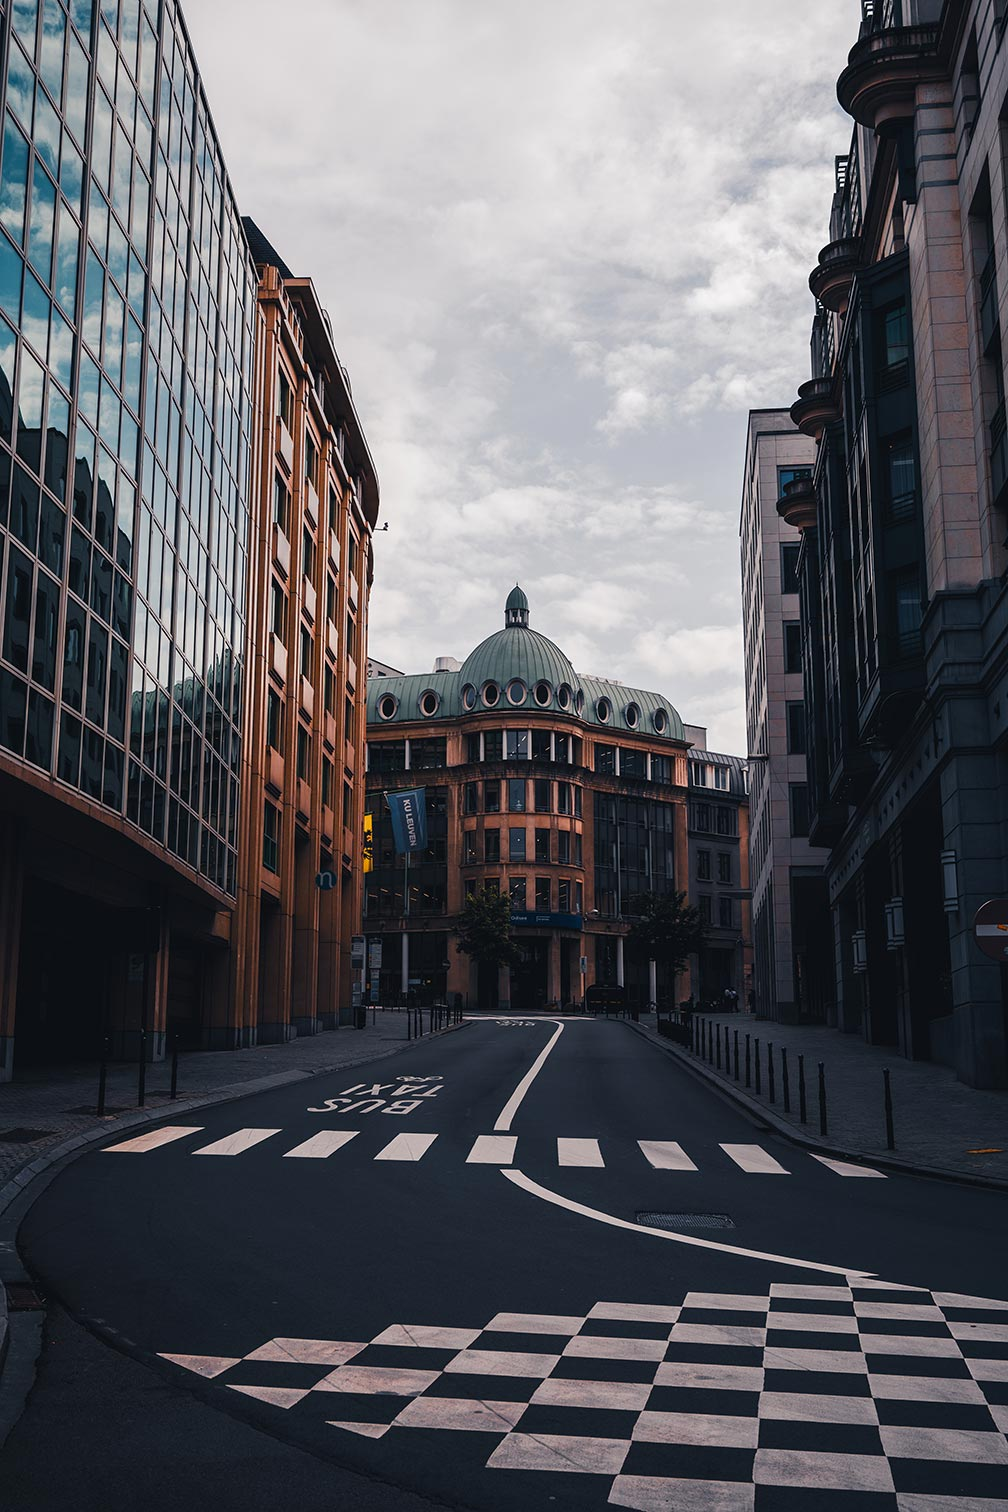 Brussel street photography